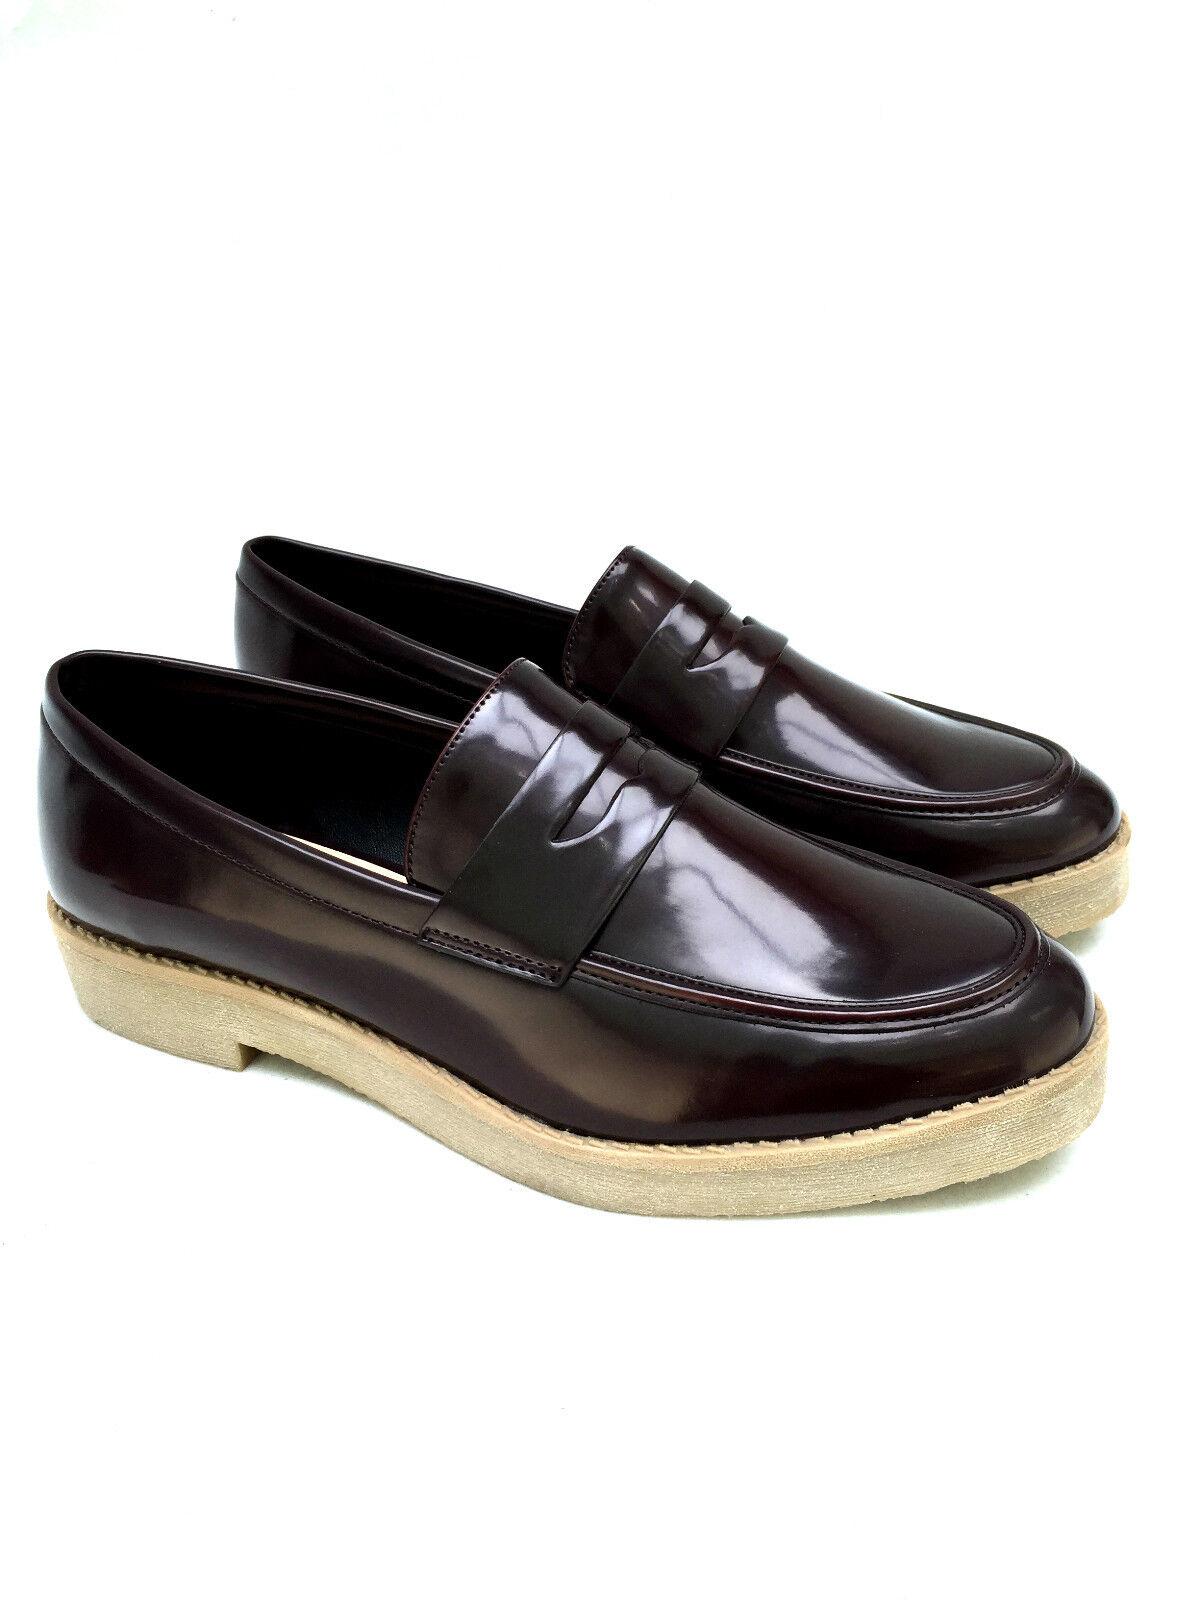 Zara Flach Slipper Mokassins Schuhe UK 6 7